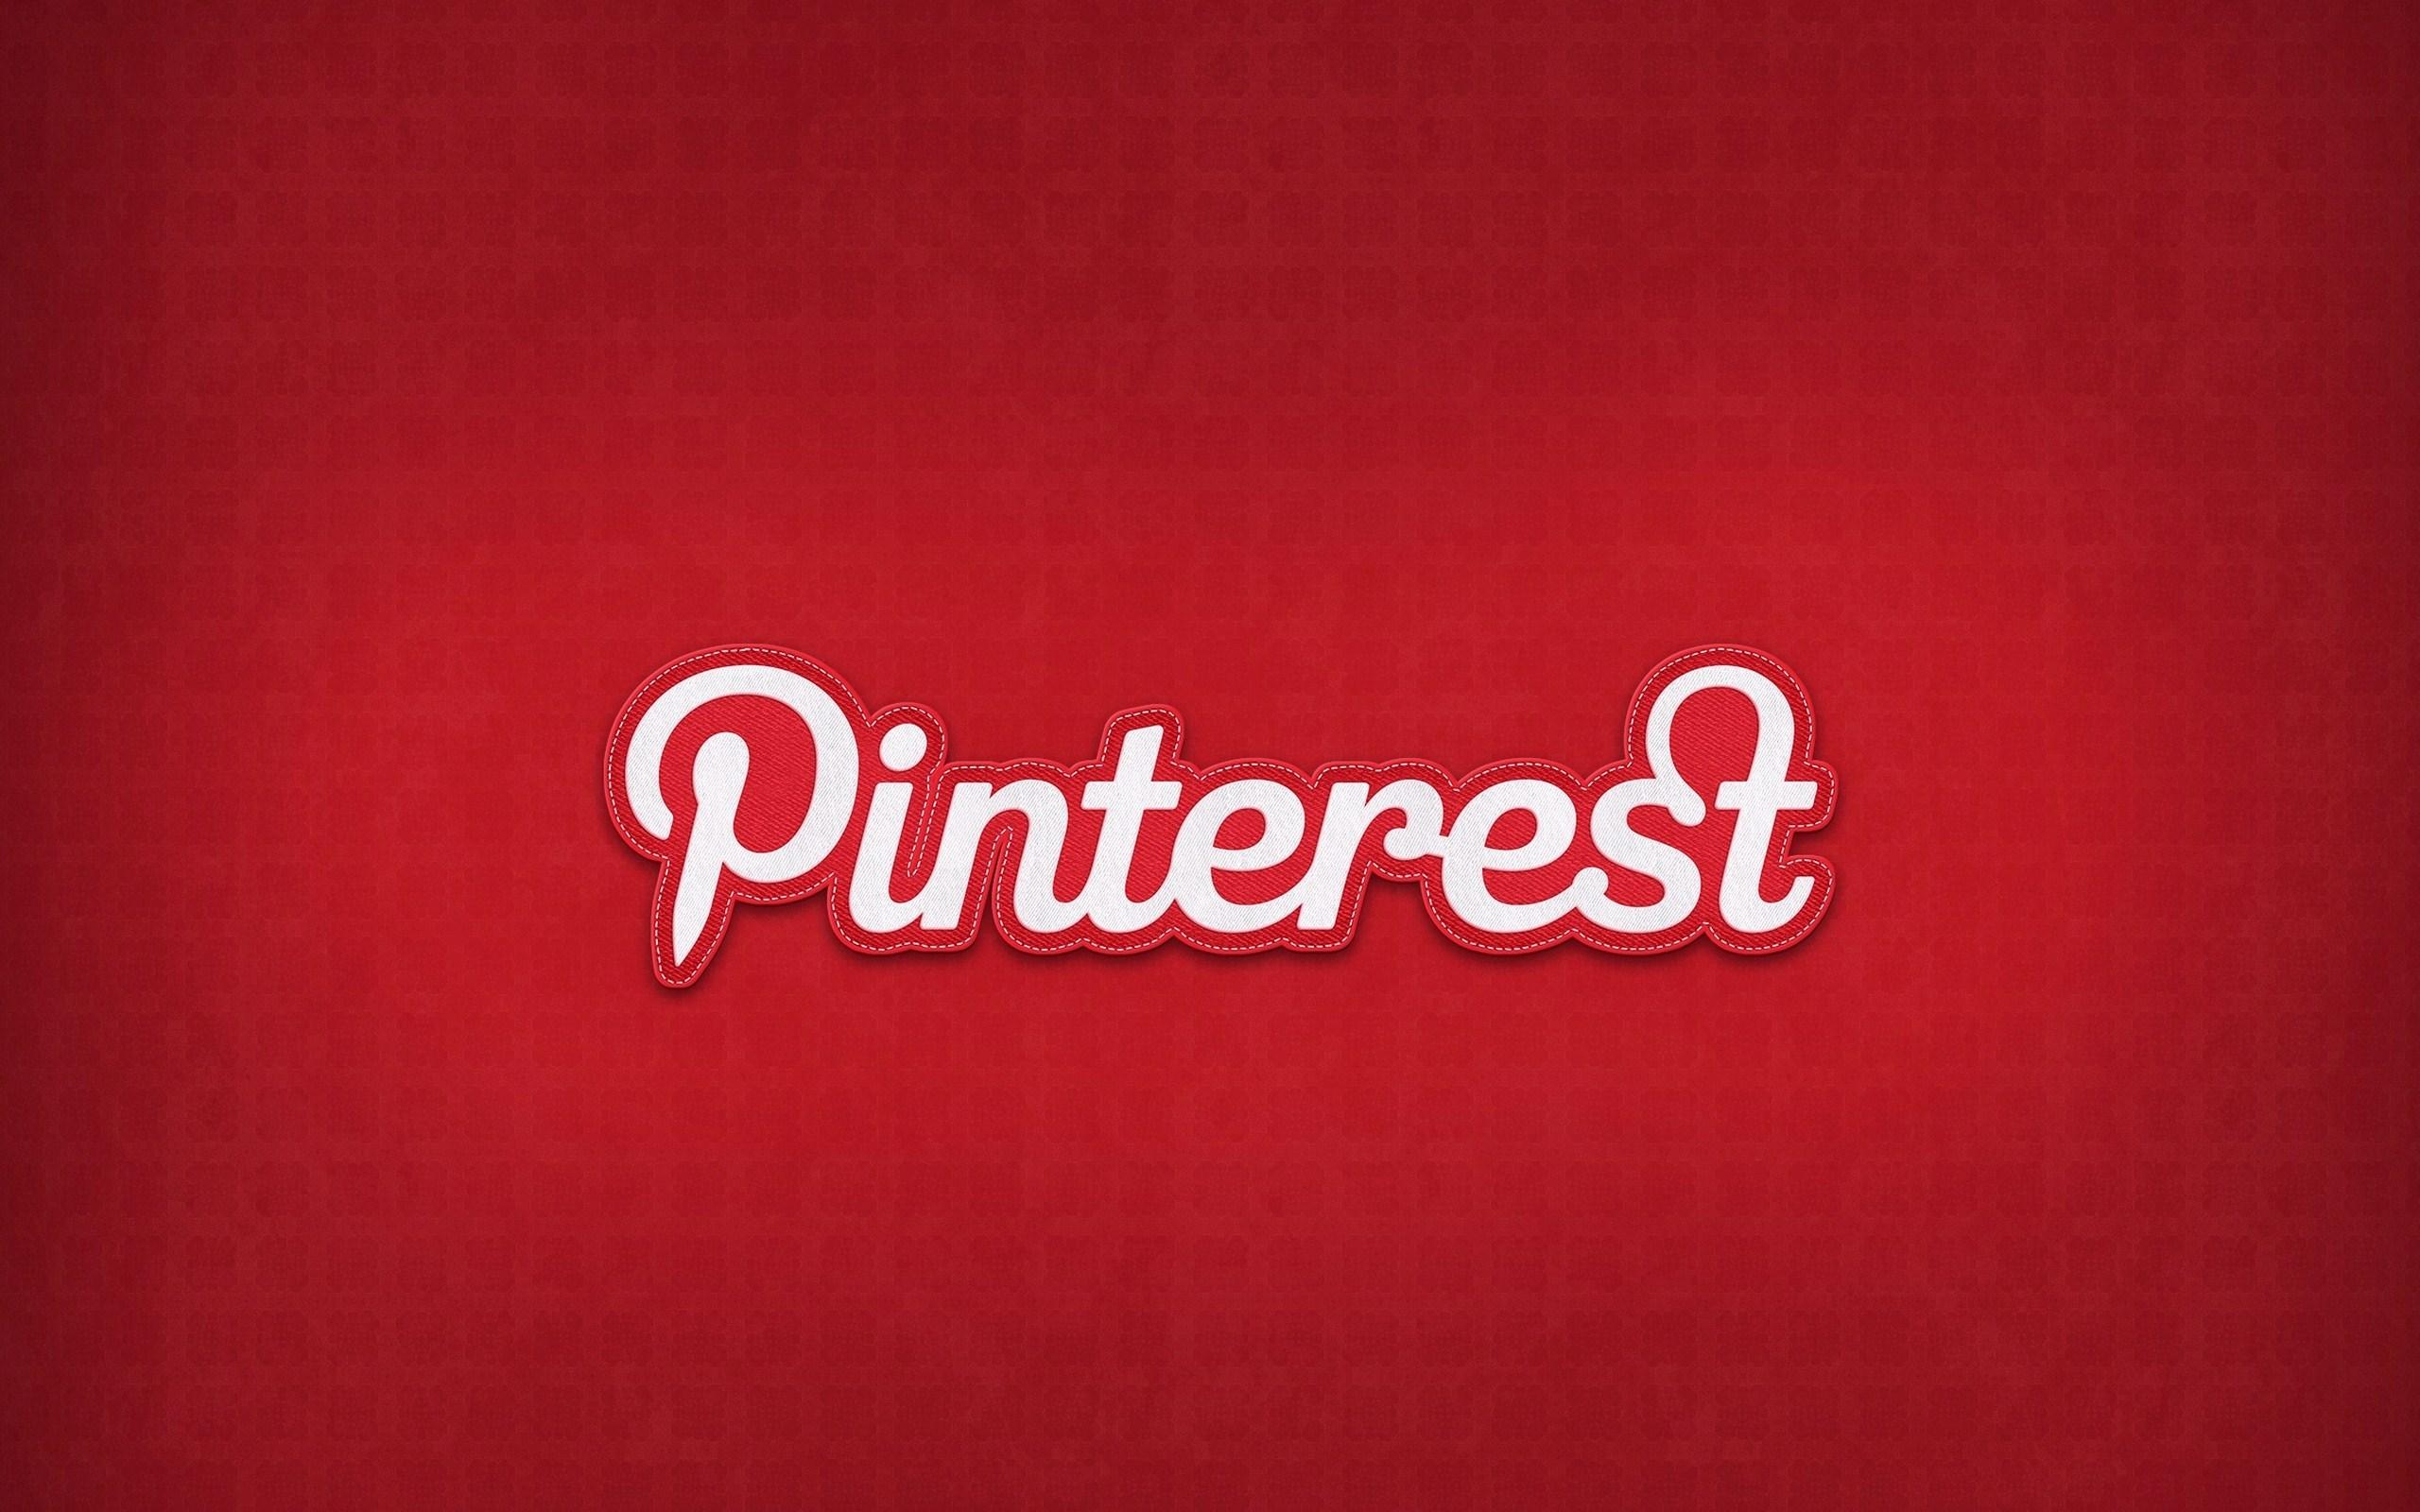 awesome pinterest logo wallpaper 40625